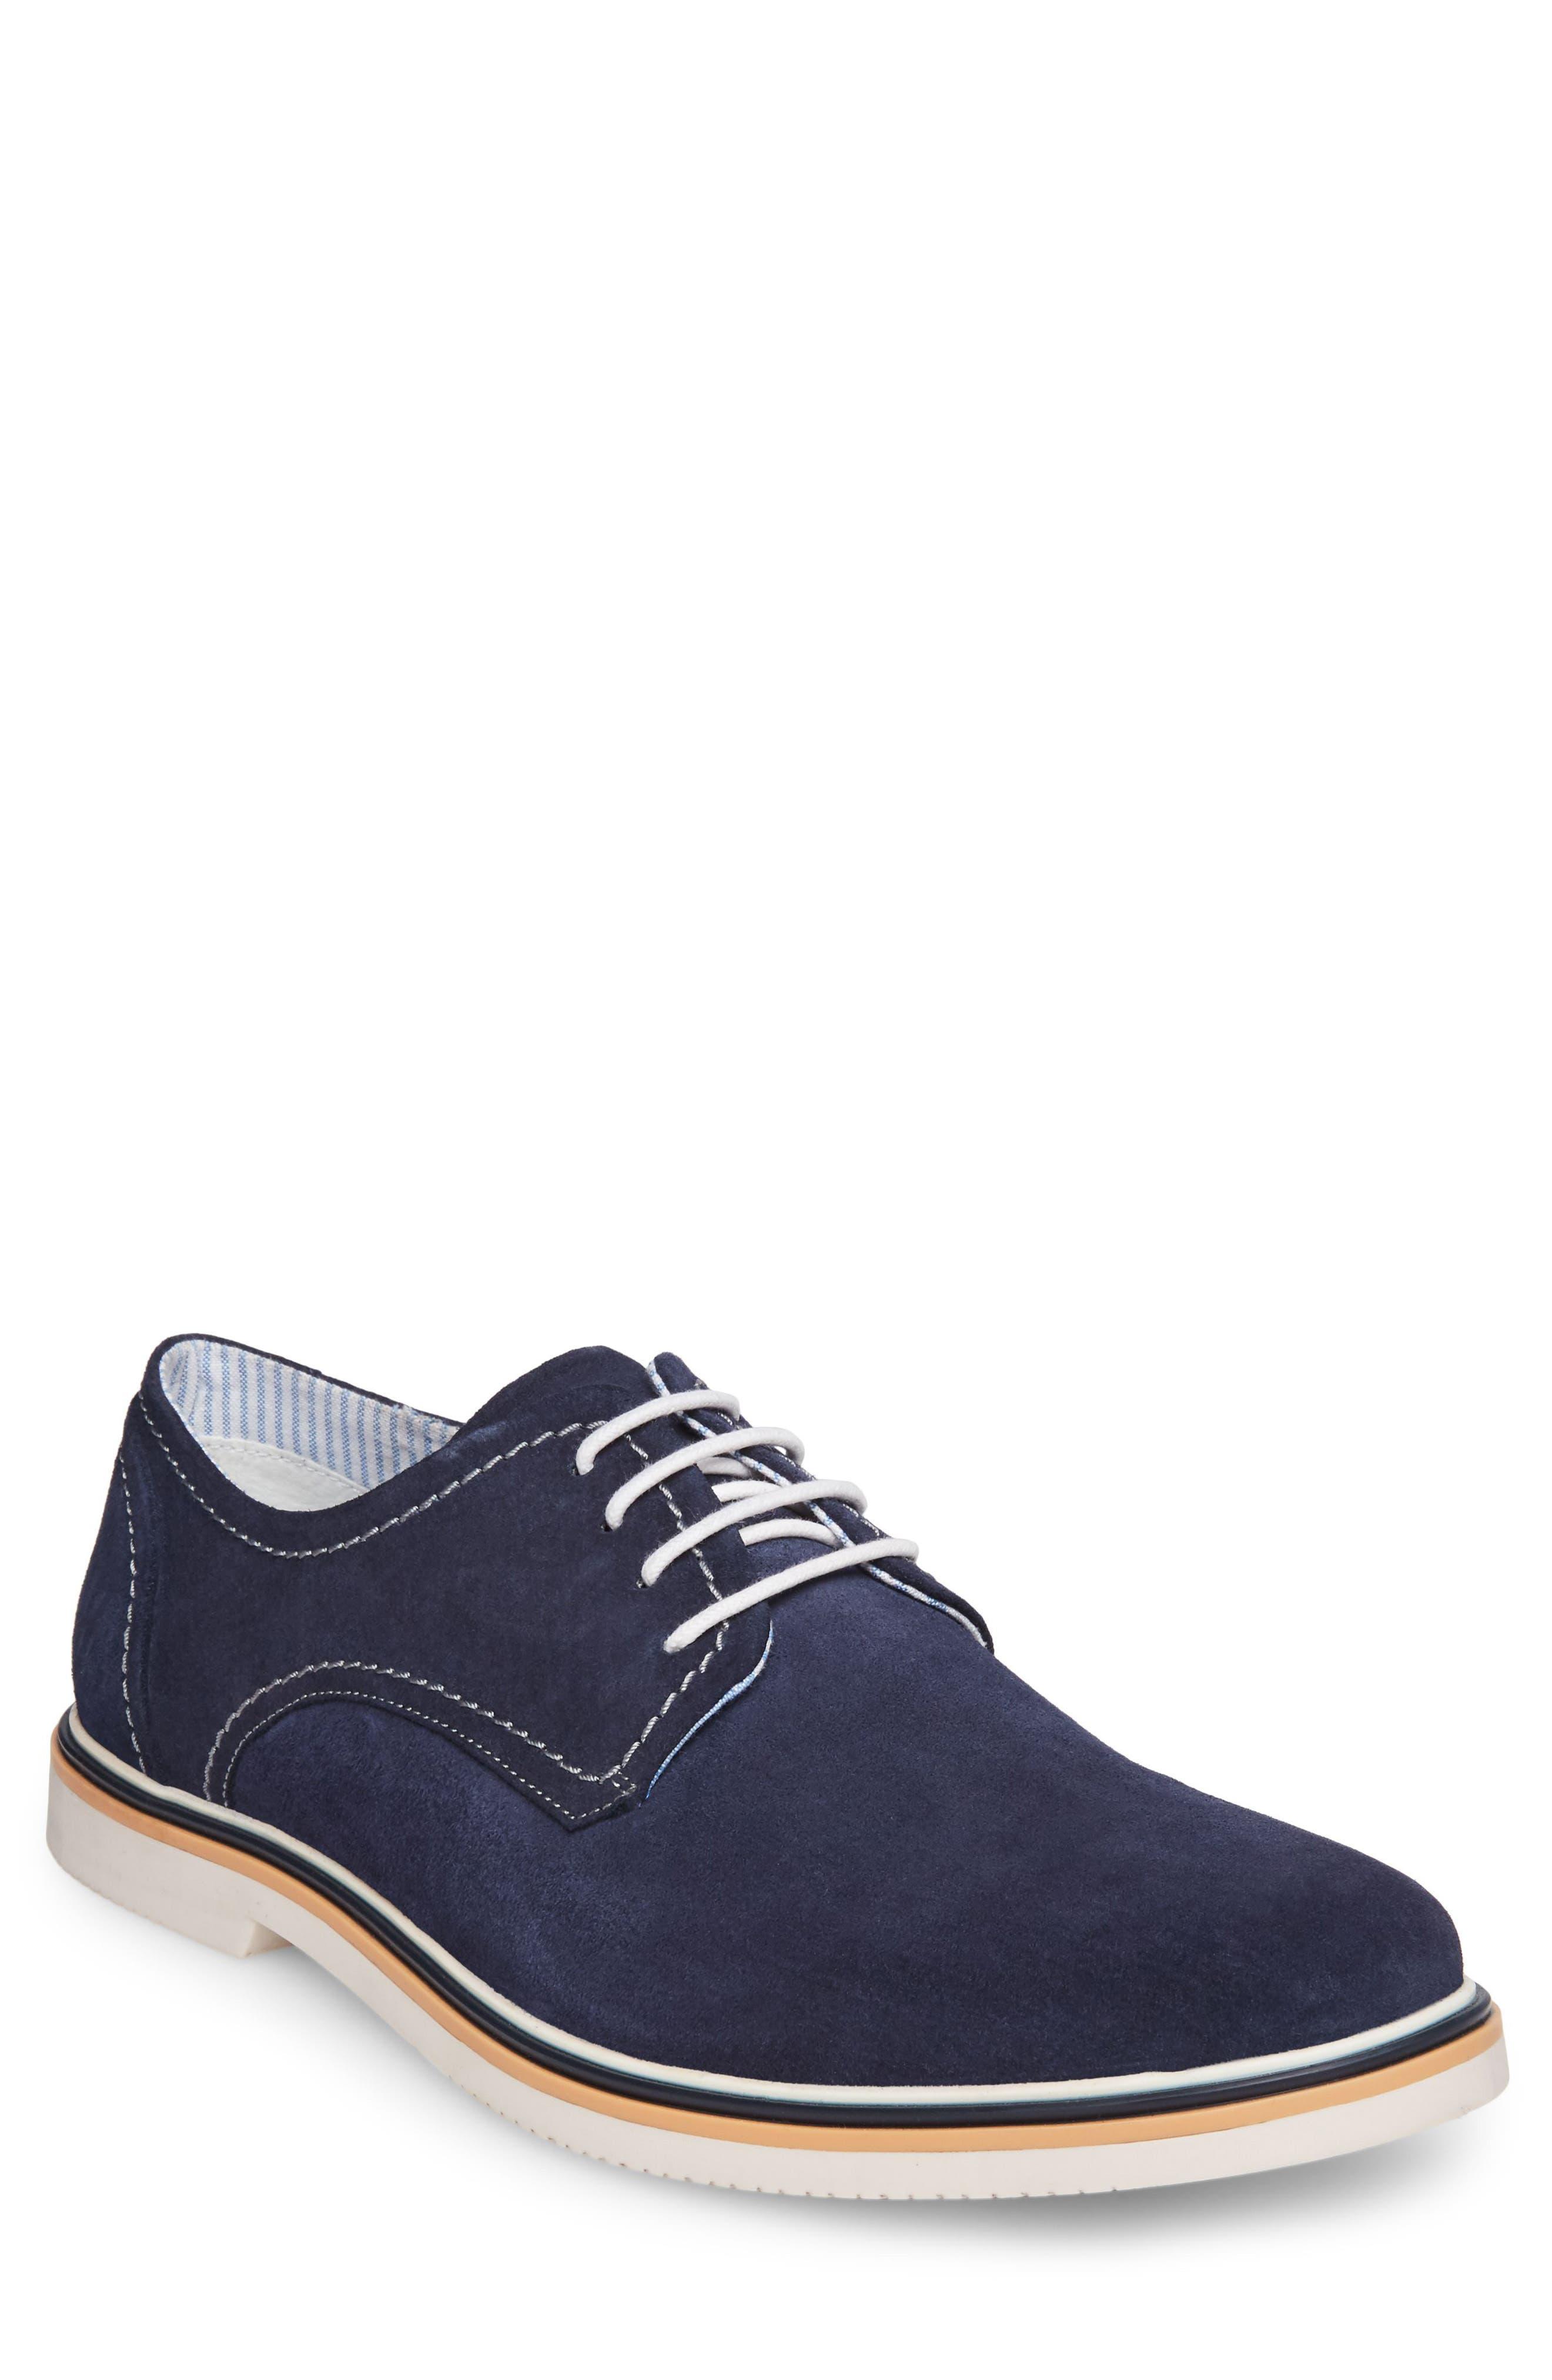 Frick Buck Shoe,                         Main,                         color, Navy Suede